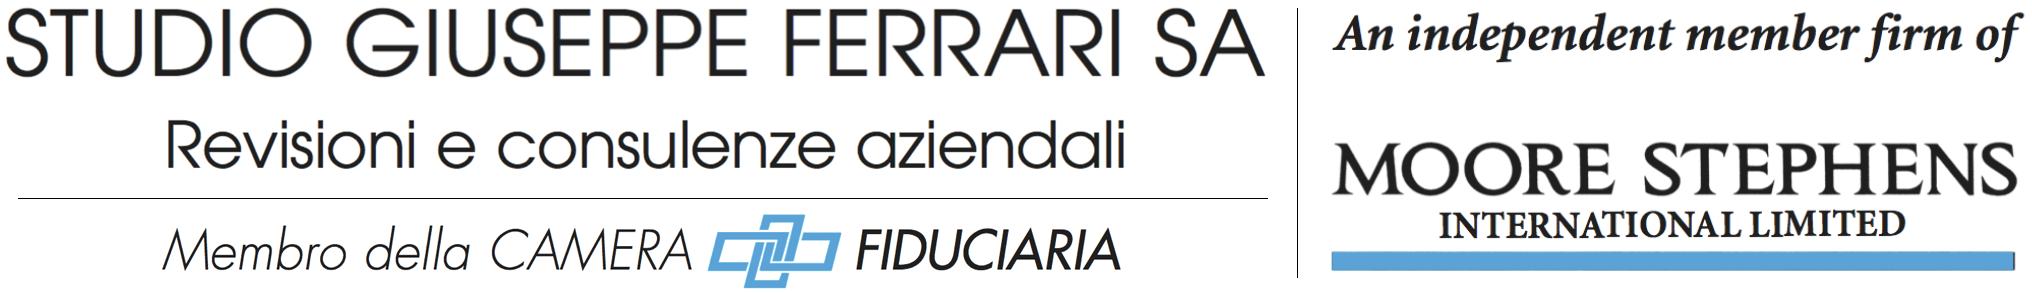 STUDIO GIUSEPPE FERRARI SA